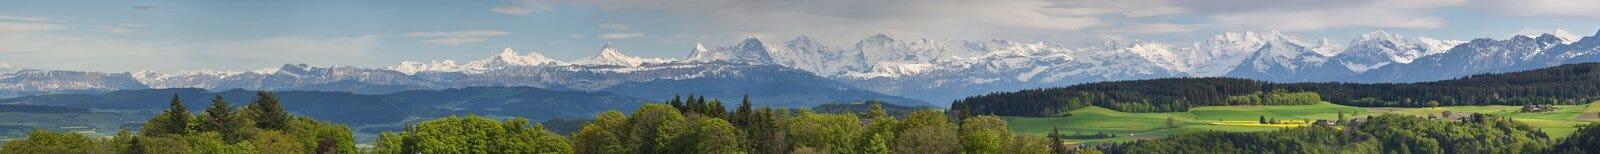 Vista panorâmica de cumes suíços Imagem de Stock Royalty Free